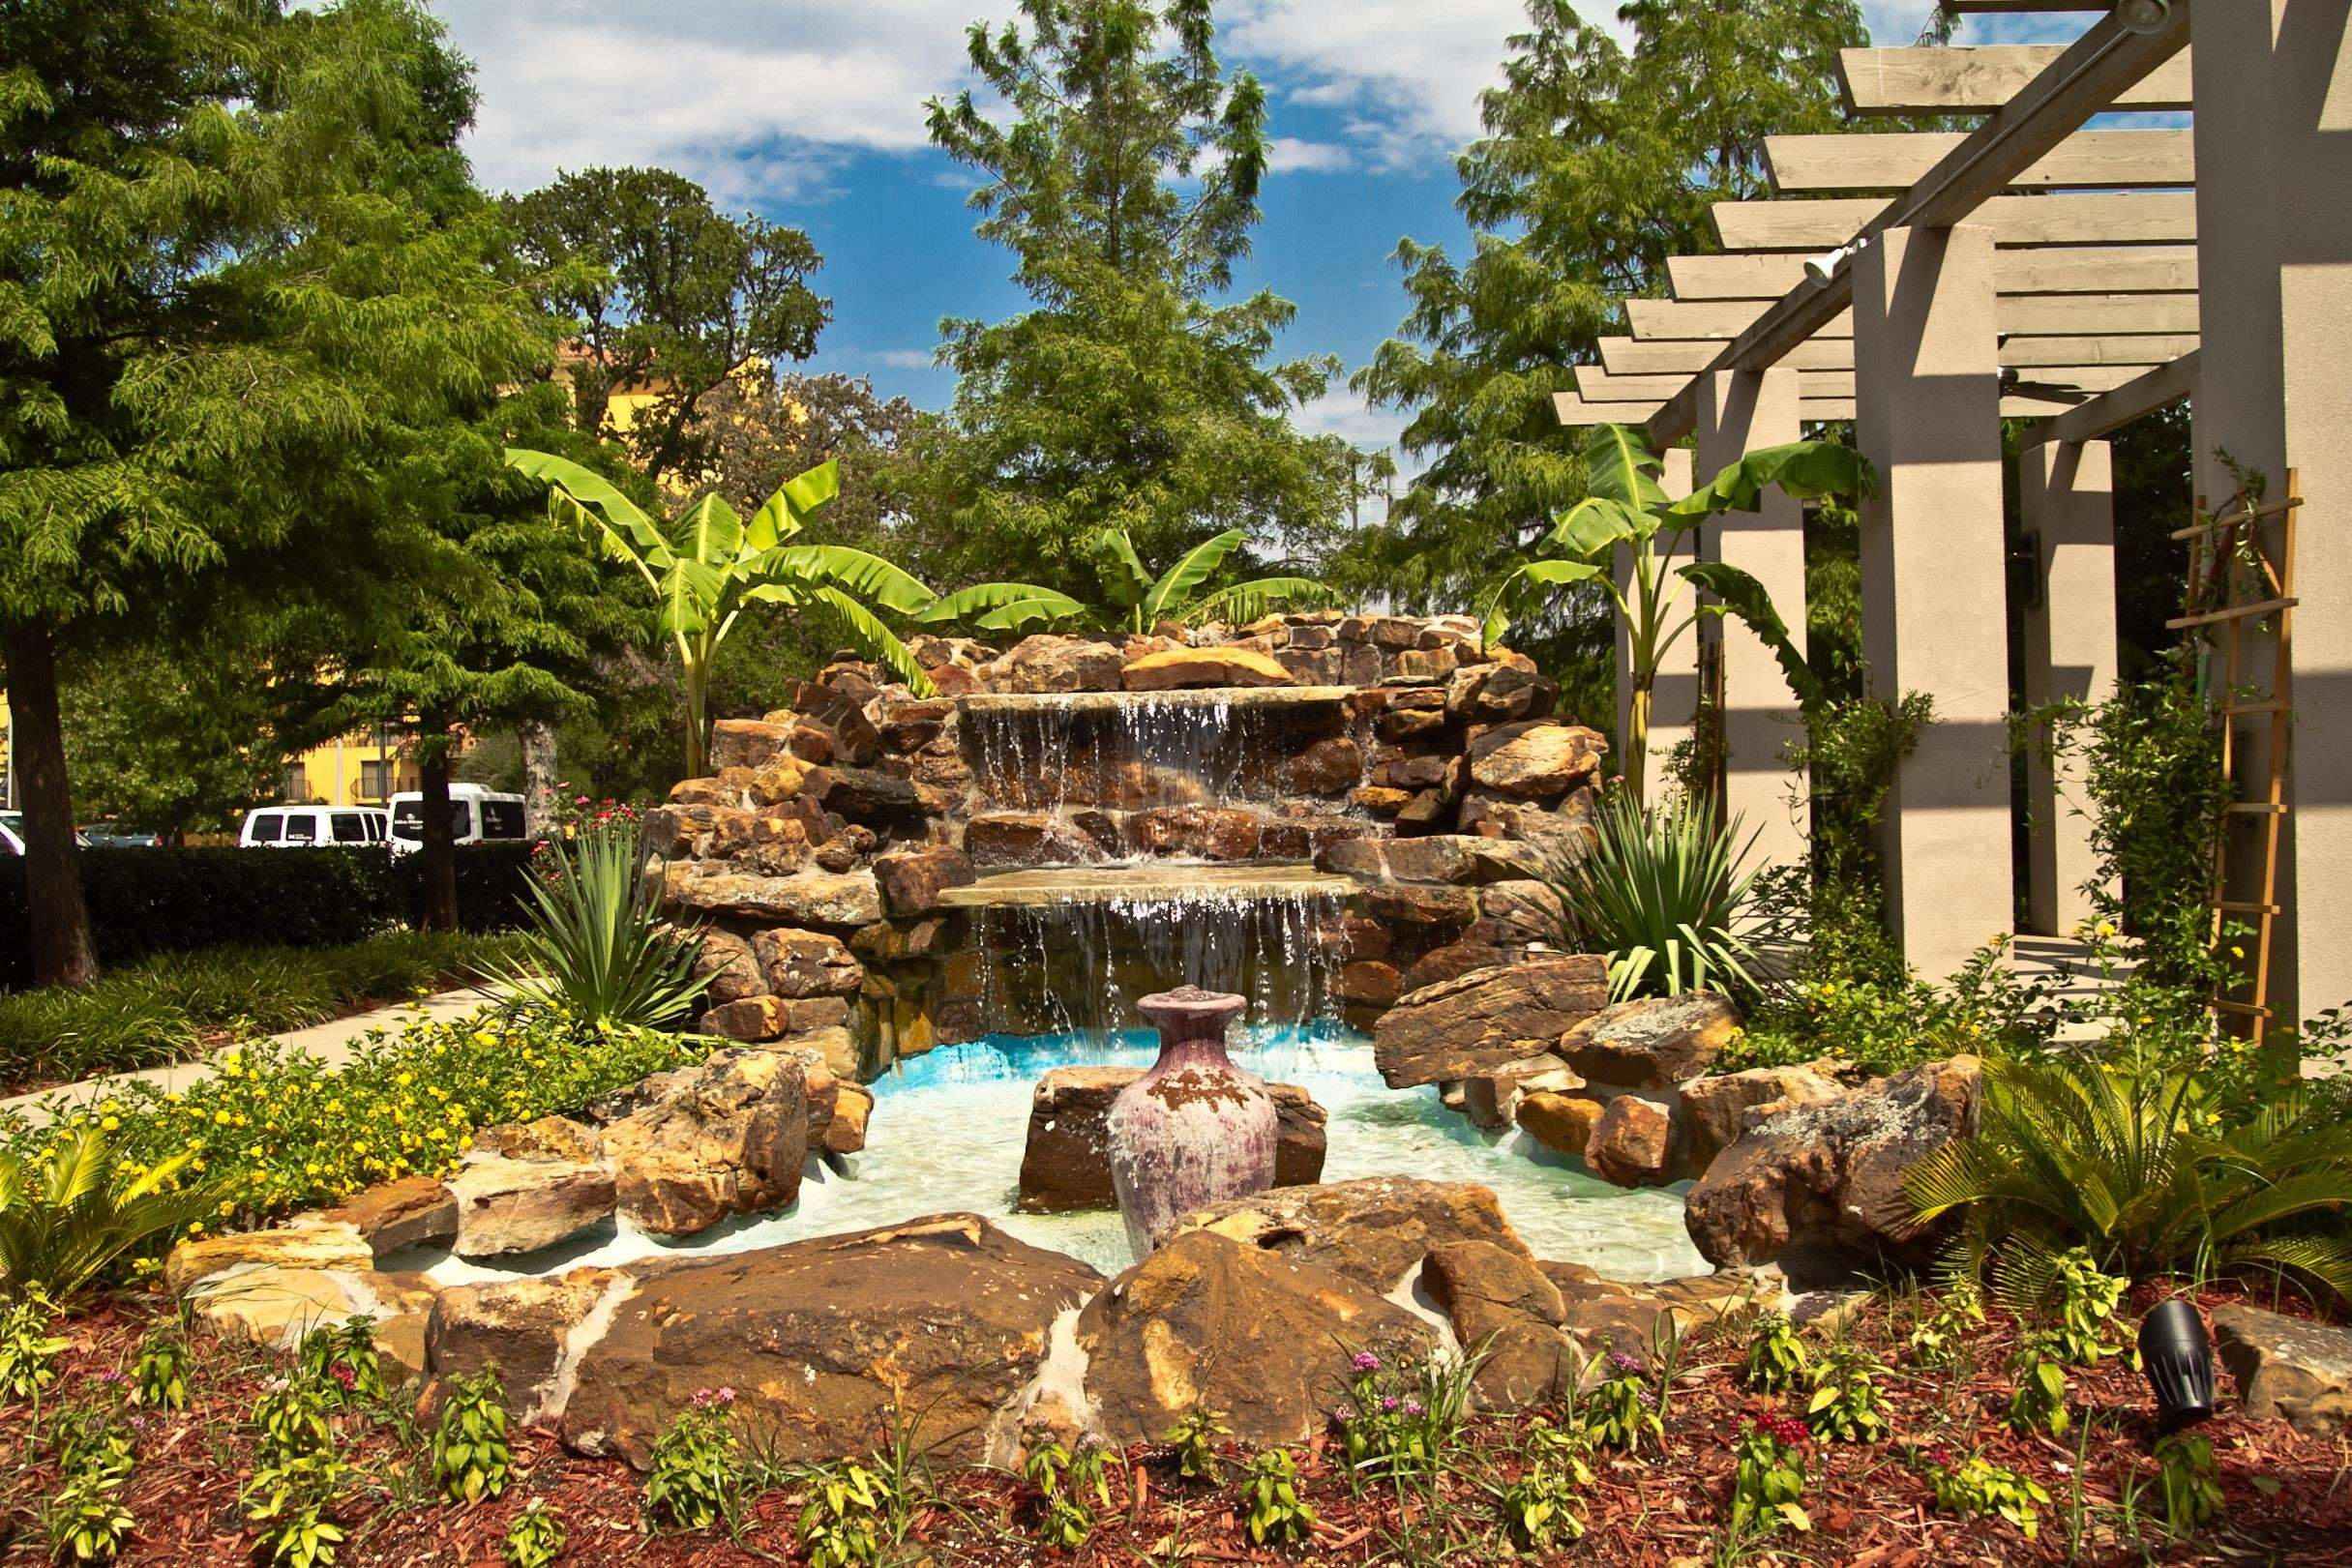 Hilton Garden Inn DFW Airport South image 5